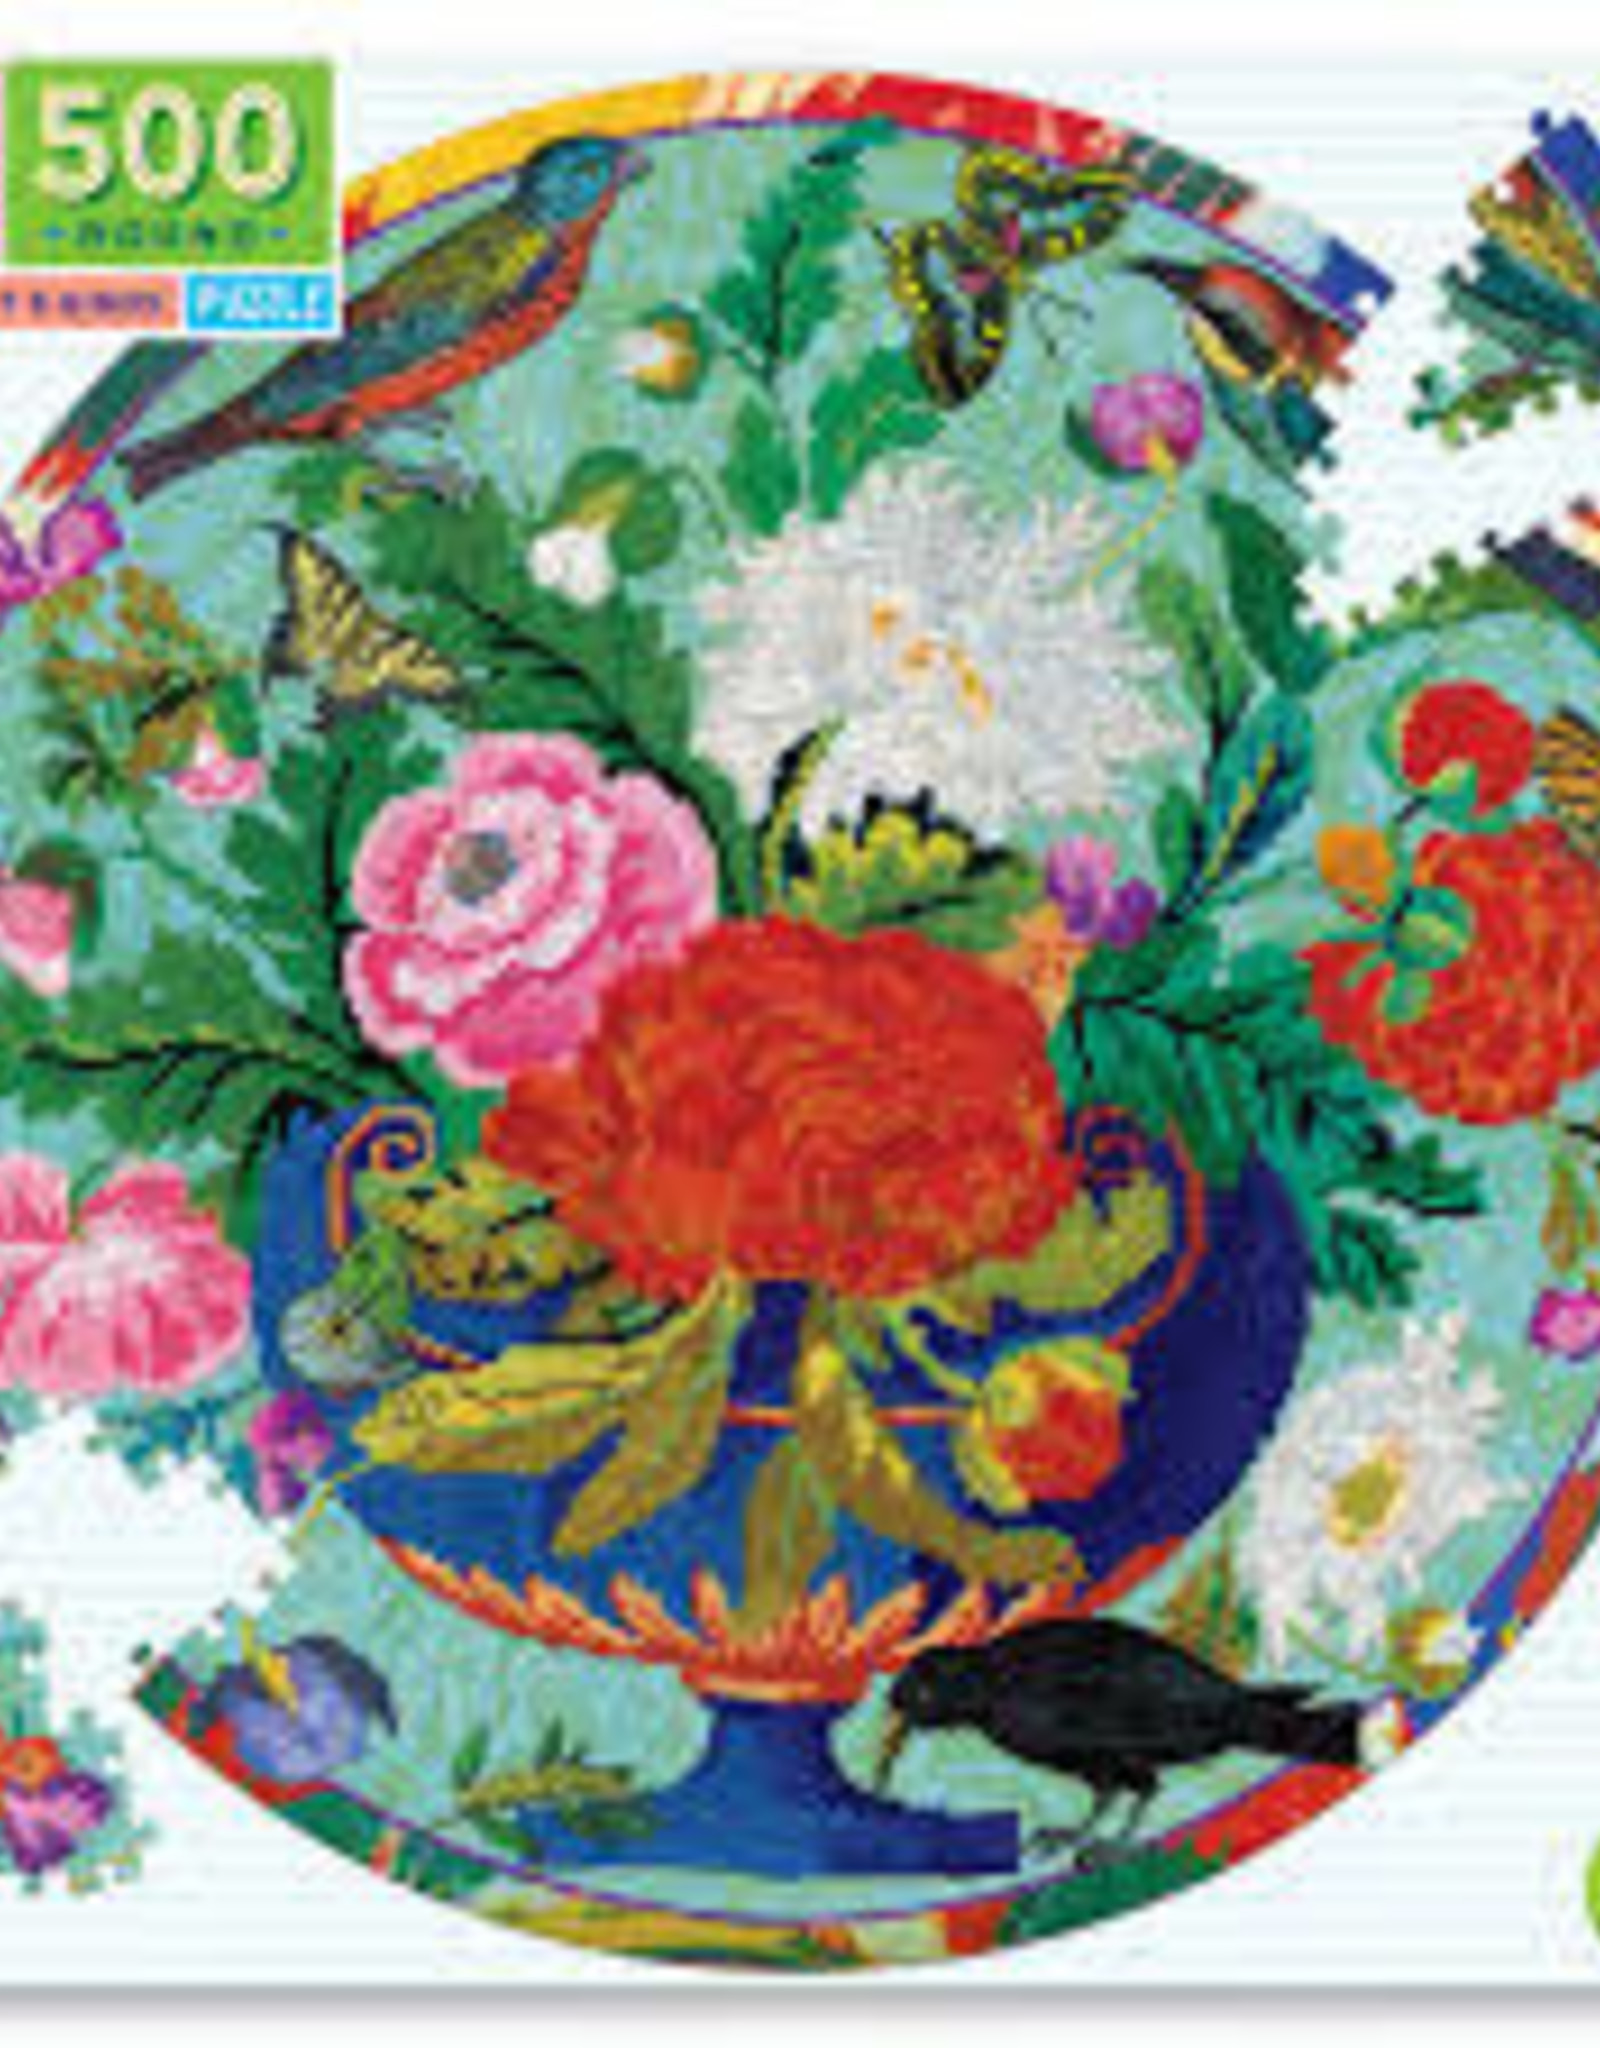 Eeboo Bouquet & Birds 500 Pc Round Puzzle